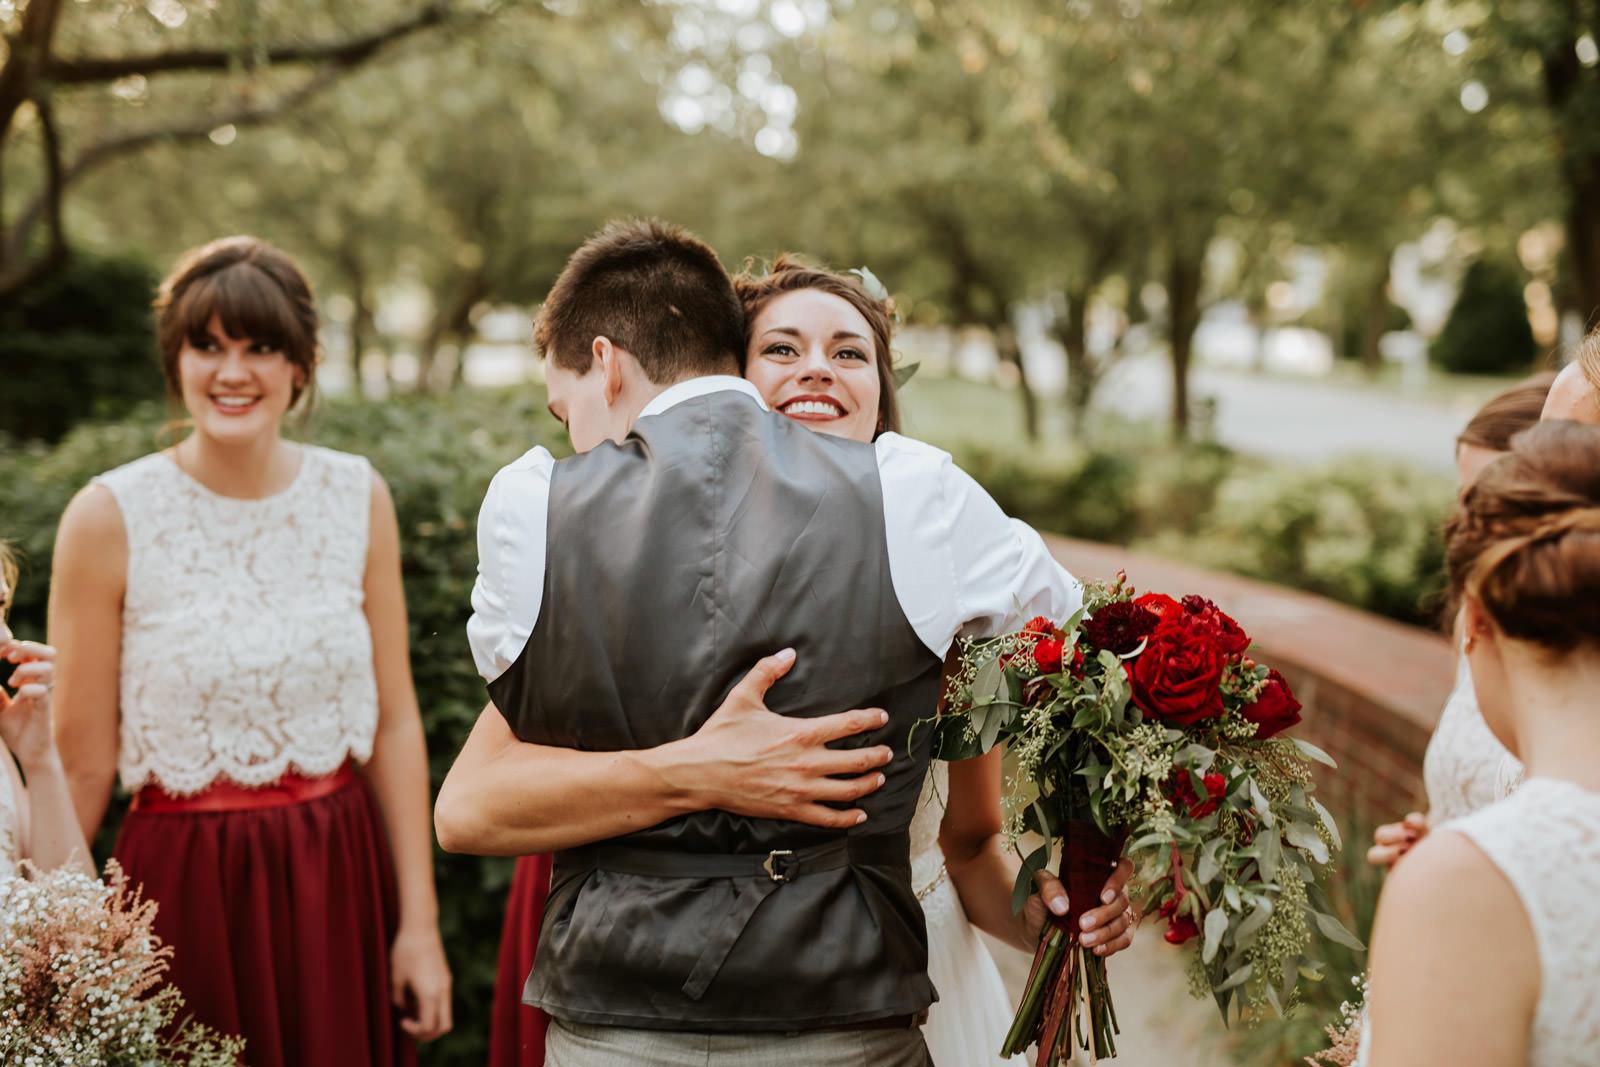 Garden wedding photography chicago Illinois